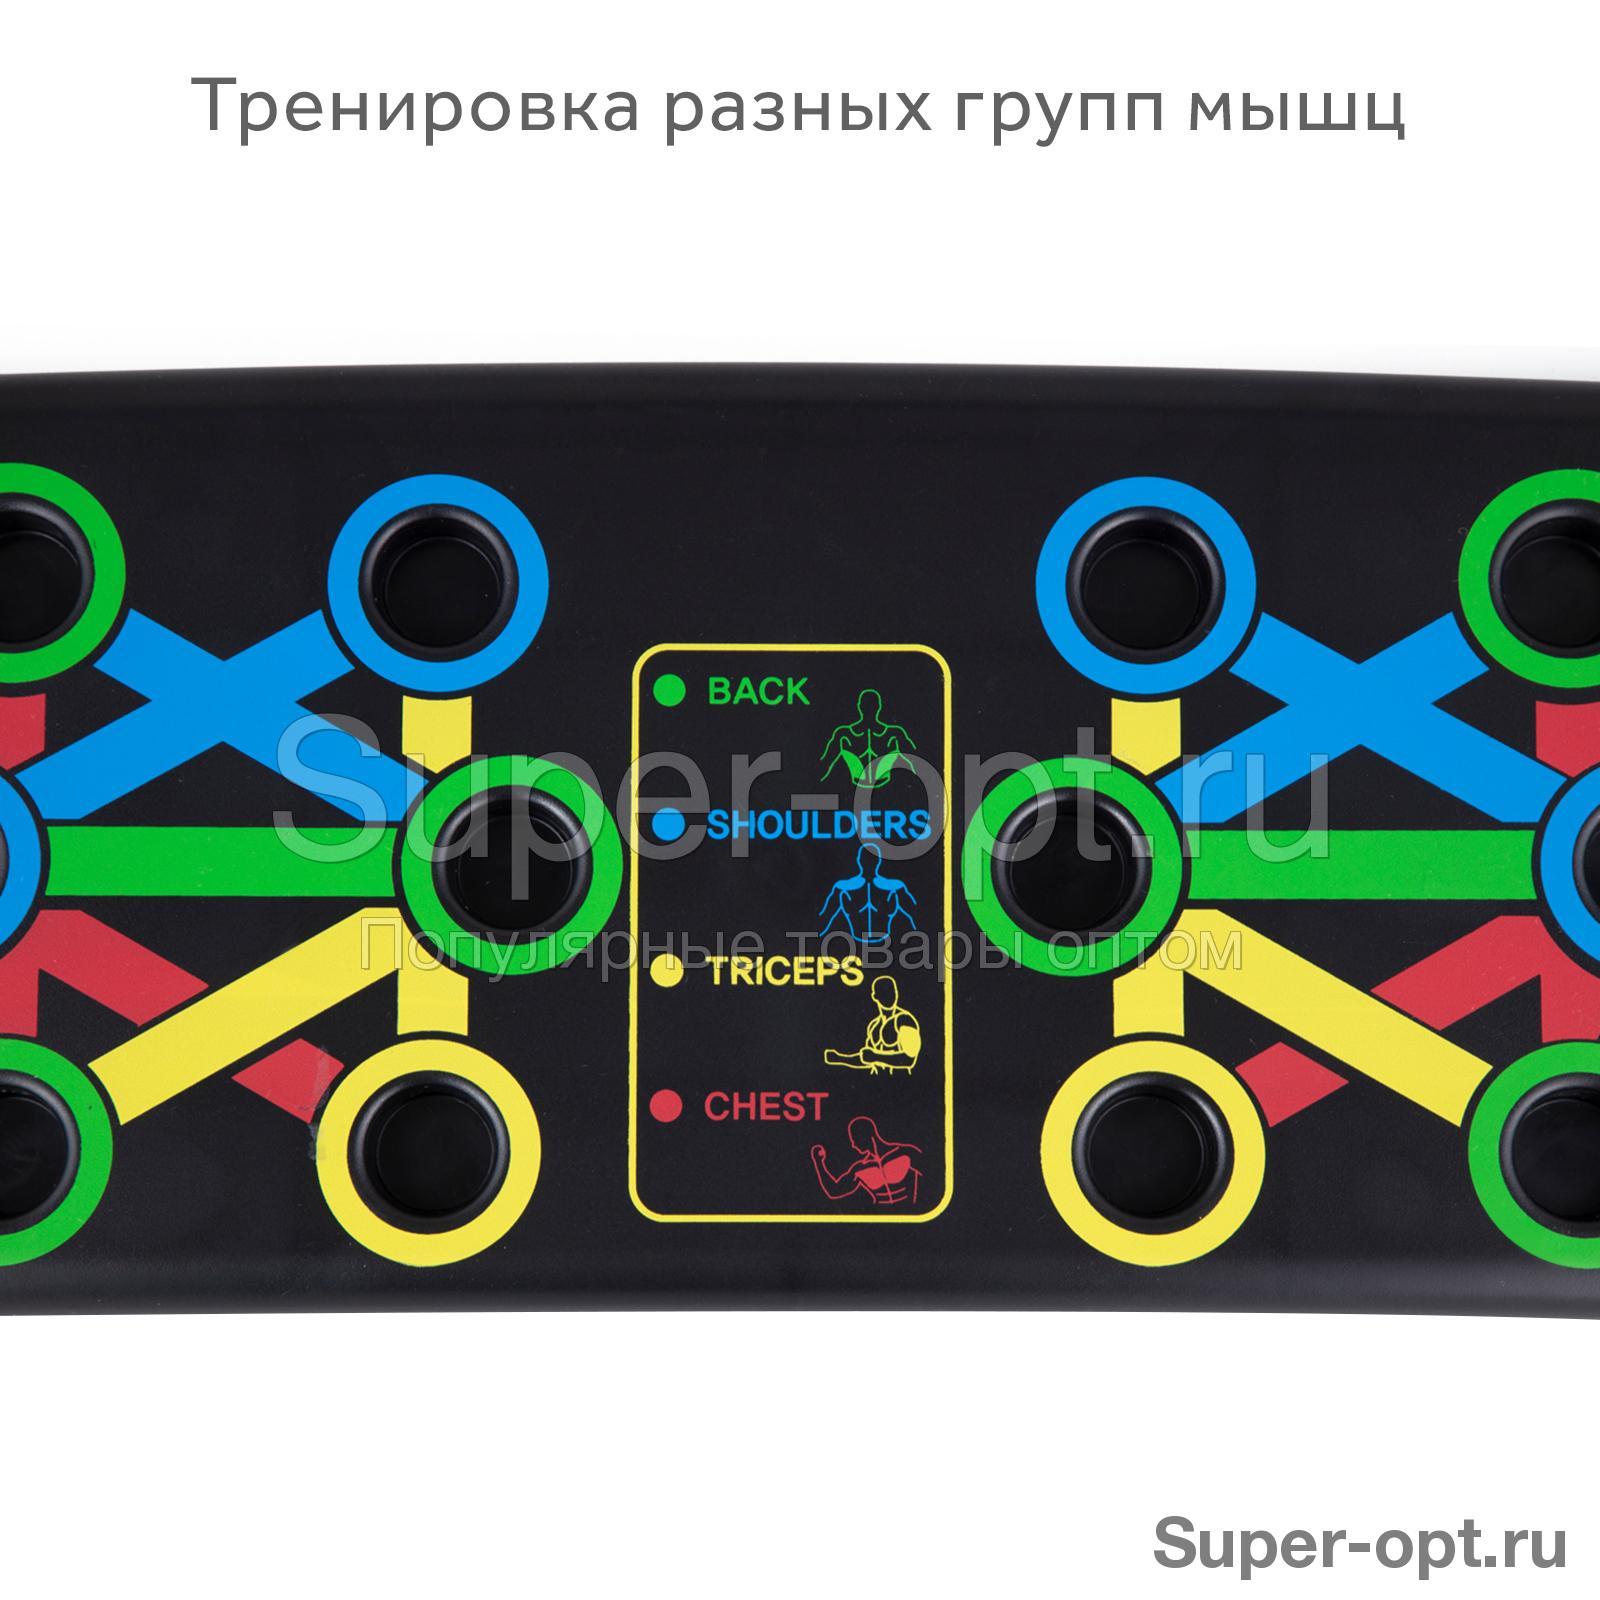 Платформа для отжиманий от пола  14 в 1 Push Up Board с упорами оптом